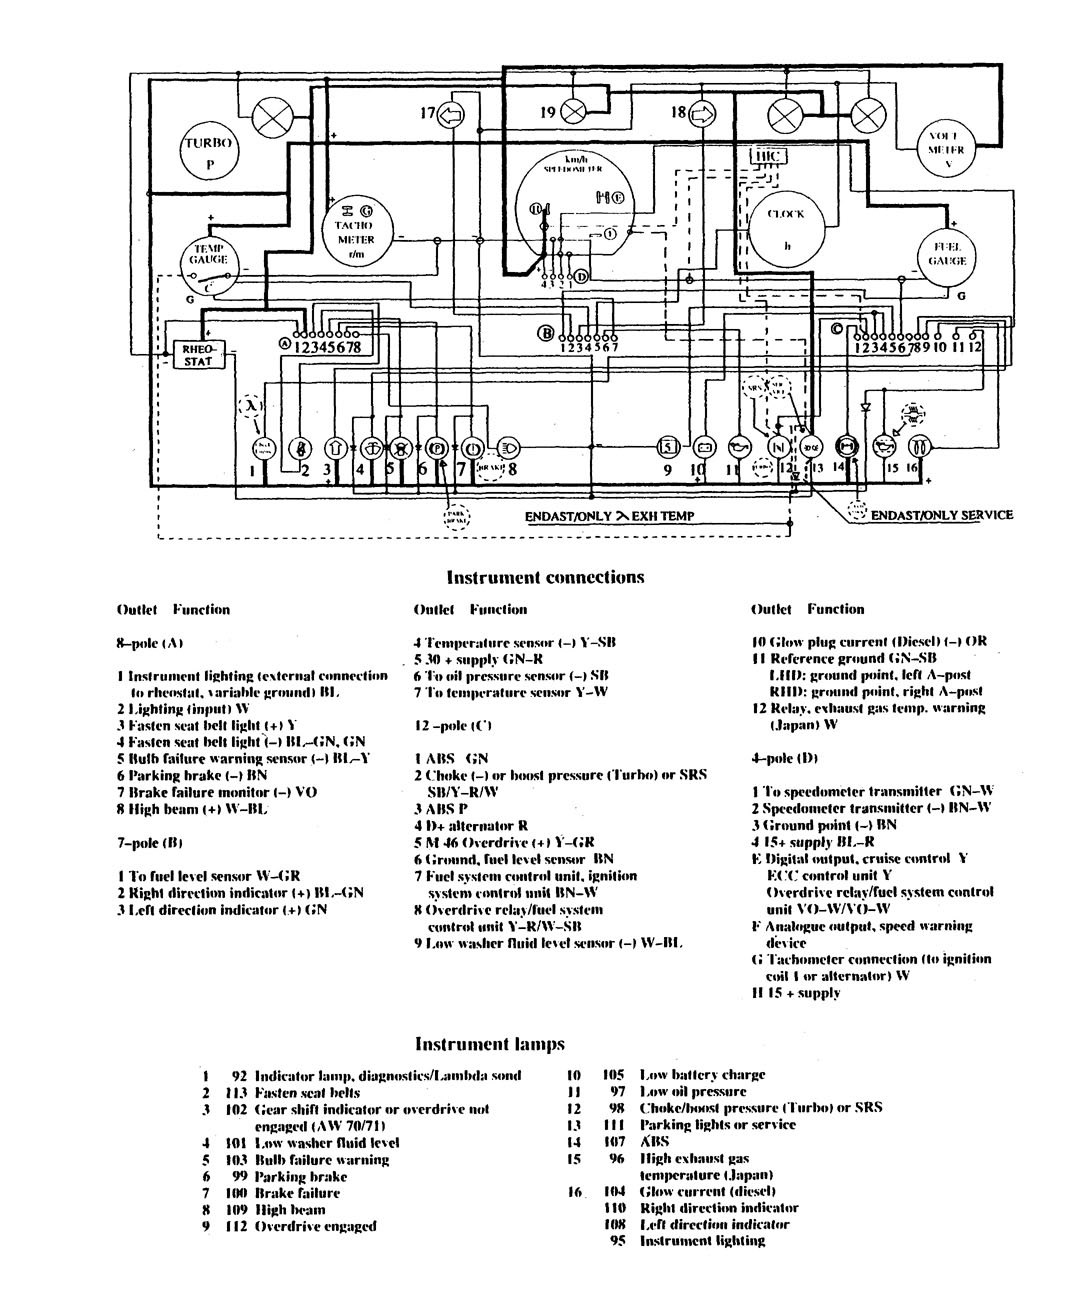 hight resolution of 98 volvo s70 glt engine diagram front brakes 98 volvo v70 d13 volvo truck wiring schematic volvo vnl truck wiring diagrams